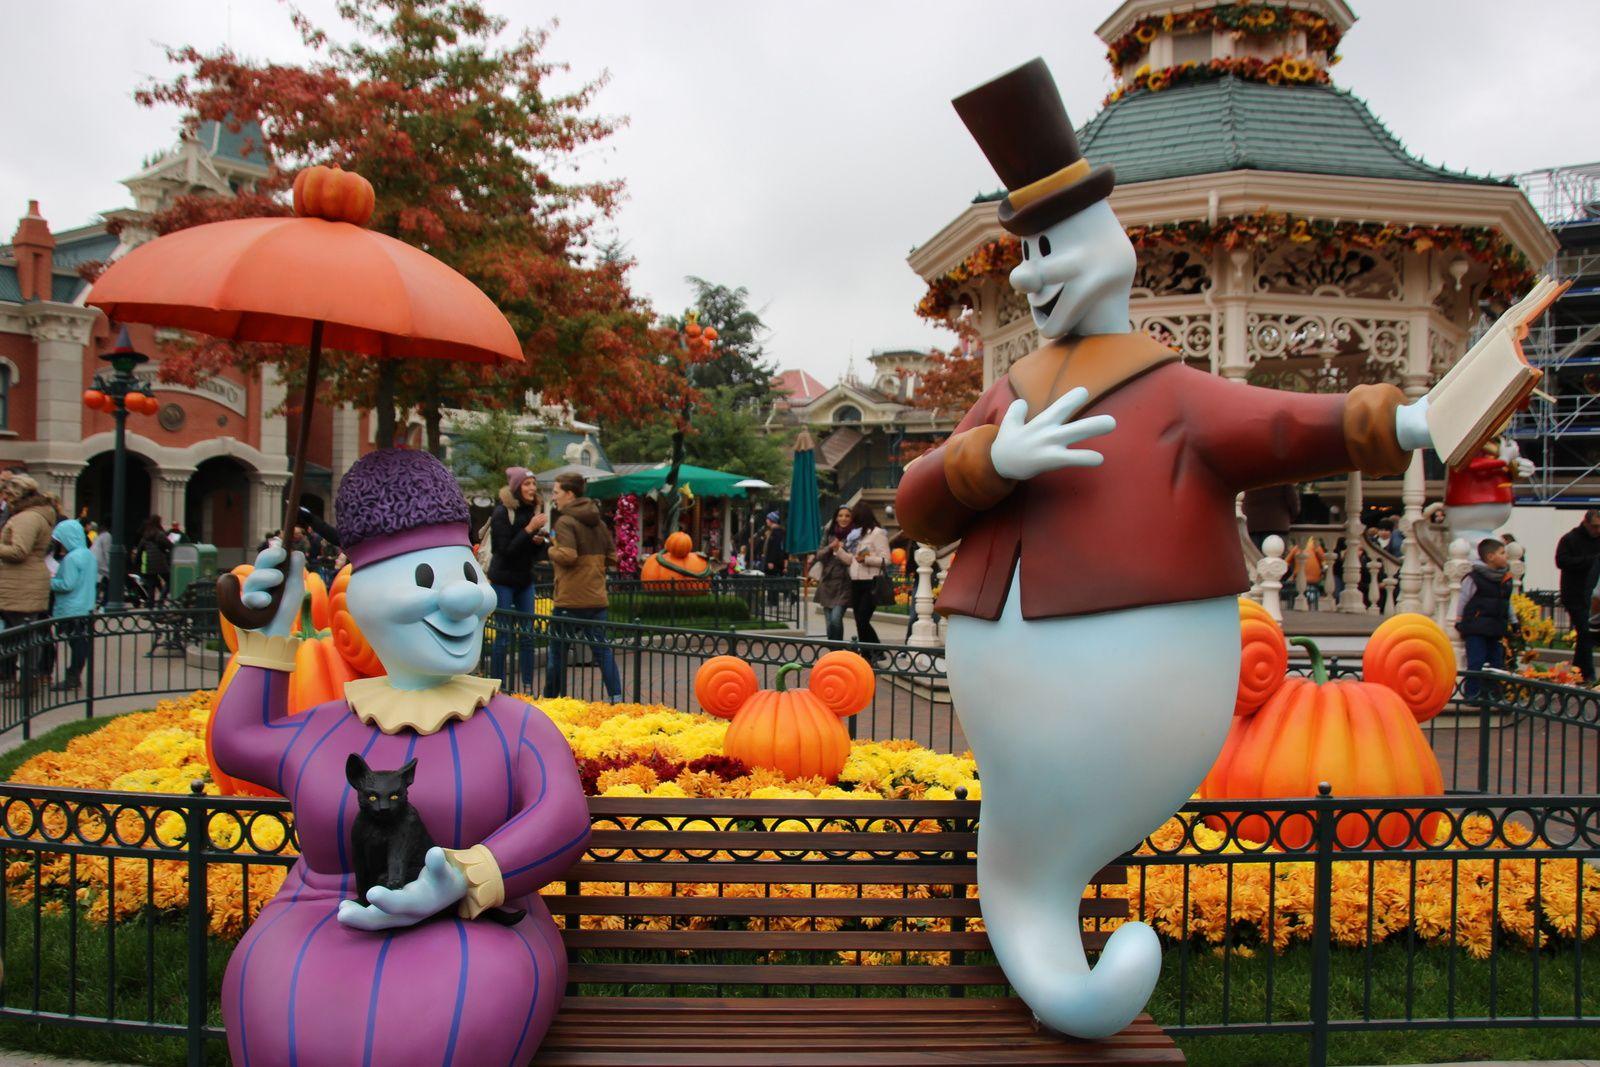 La saison Halloween à Disneyland Paris (2015)